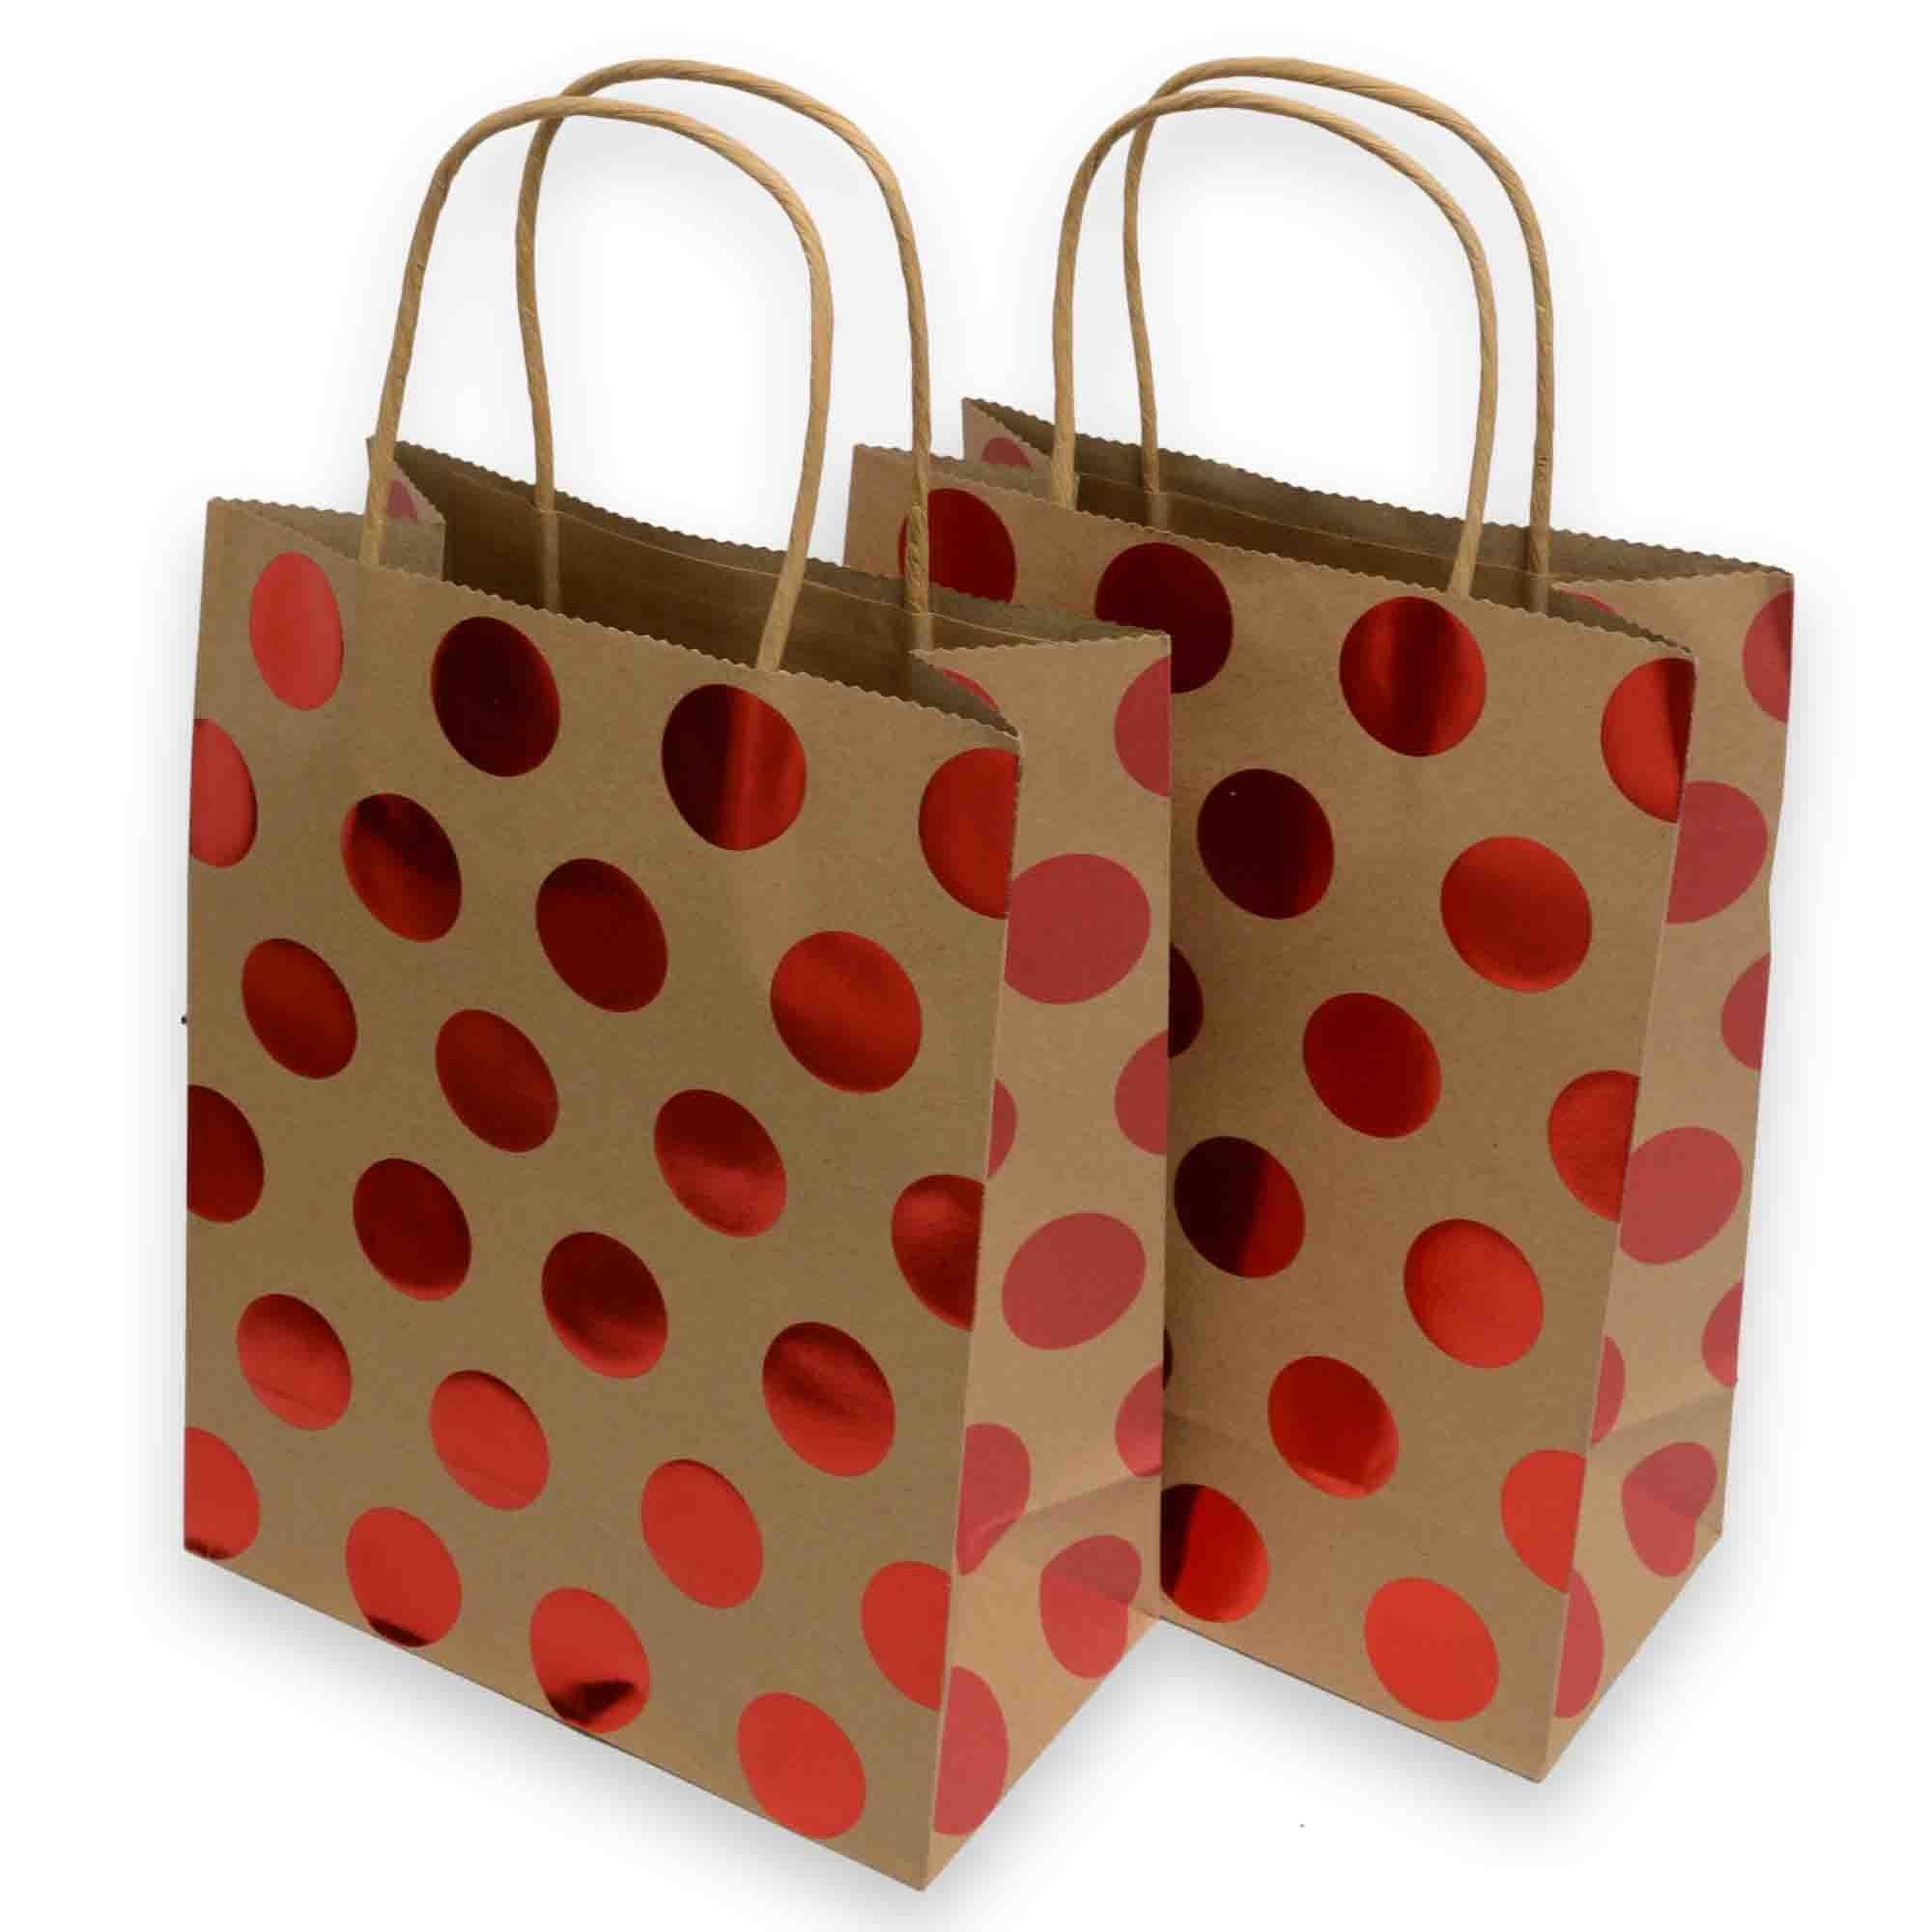 16 X 12 Custom Printed Kraft Paper Wedding Gift Bags: Amazon.com: Kraft Gift Bags, Foil Hot-stamp Polka-dot